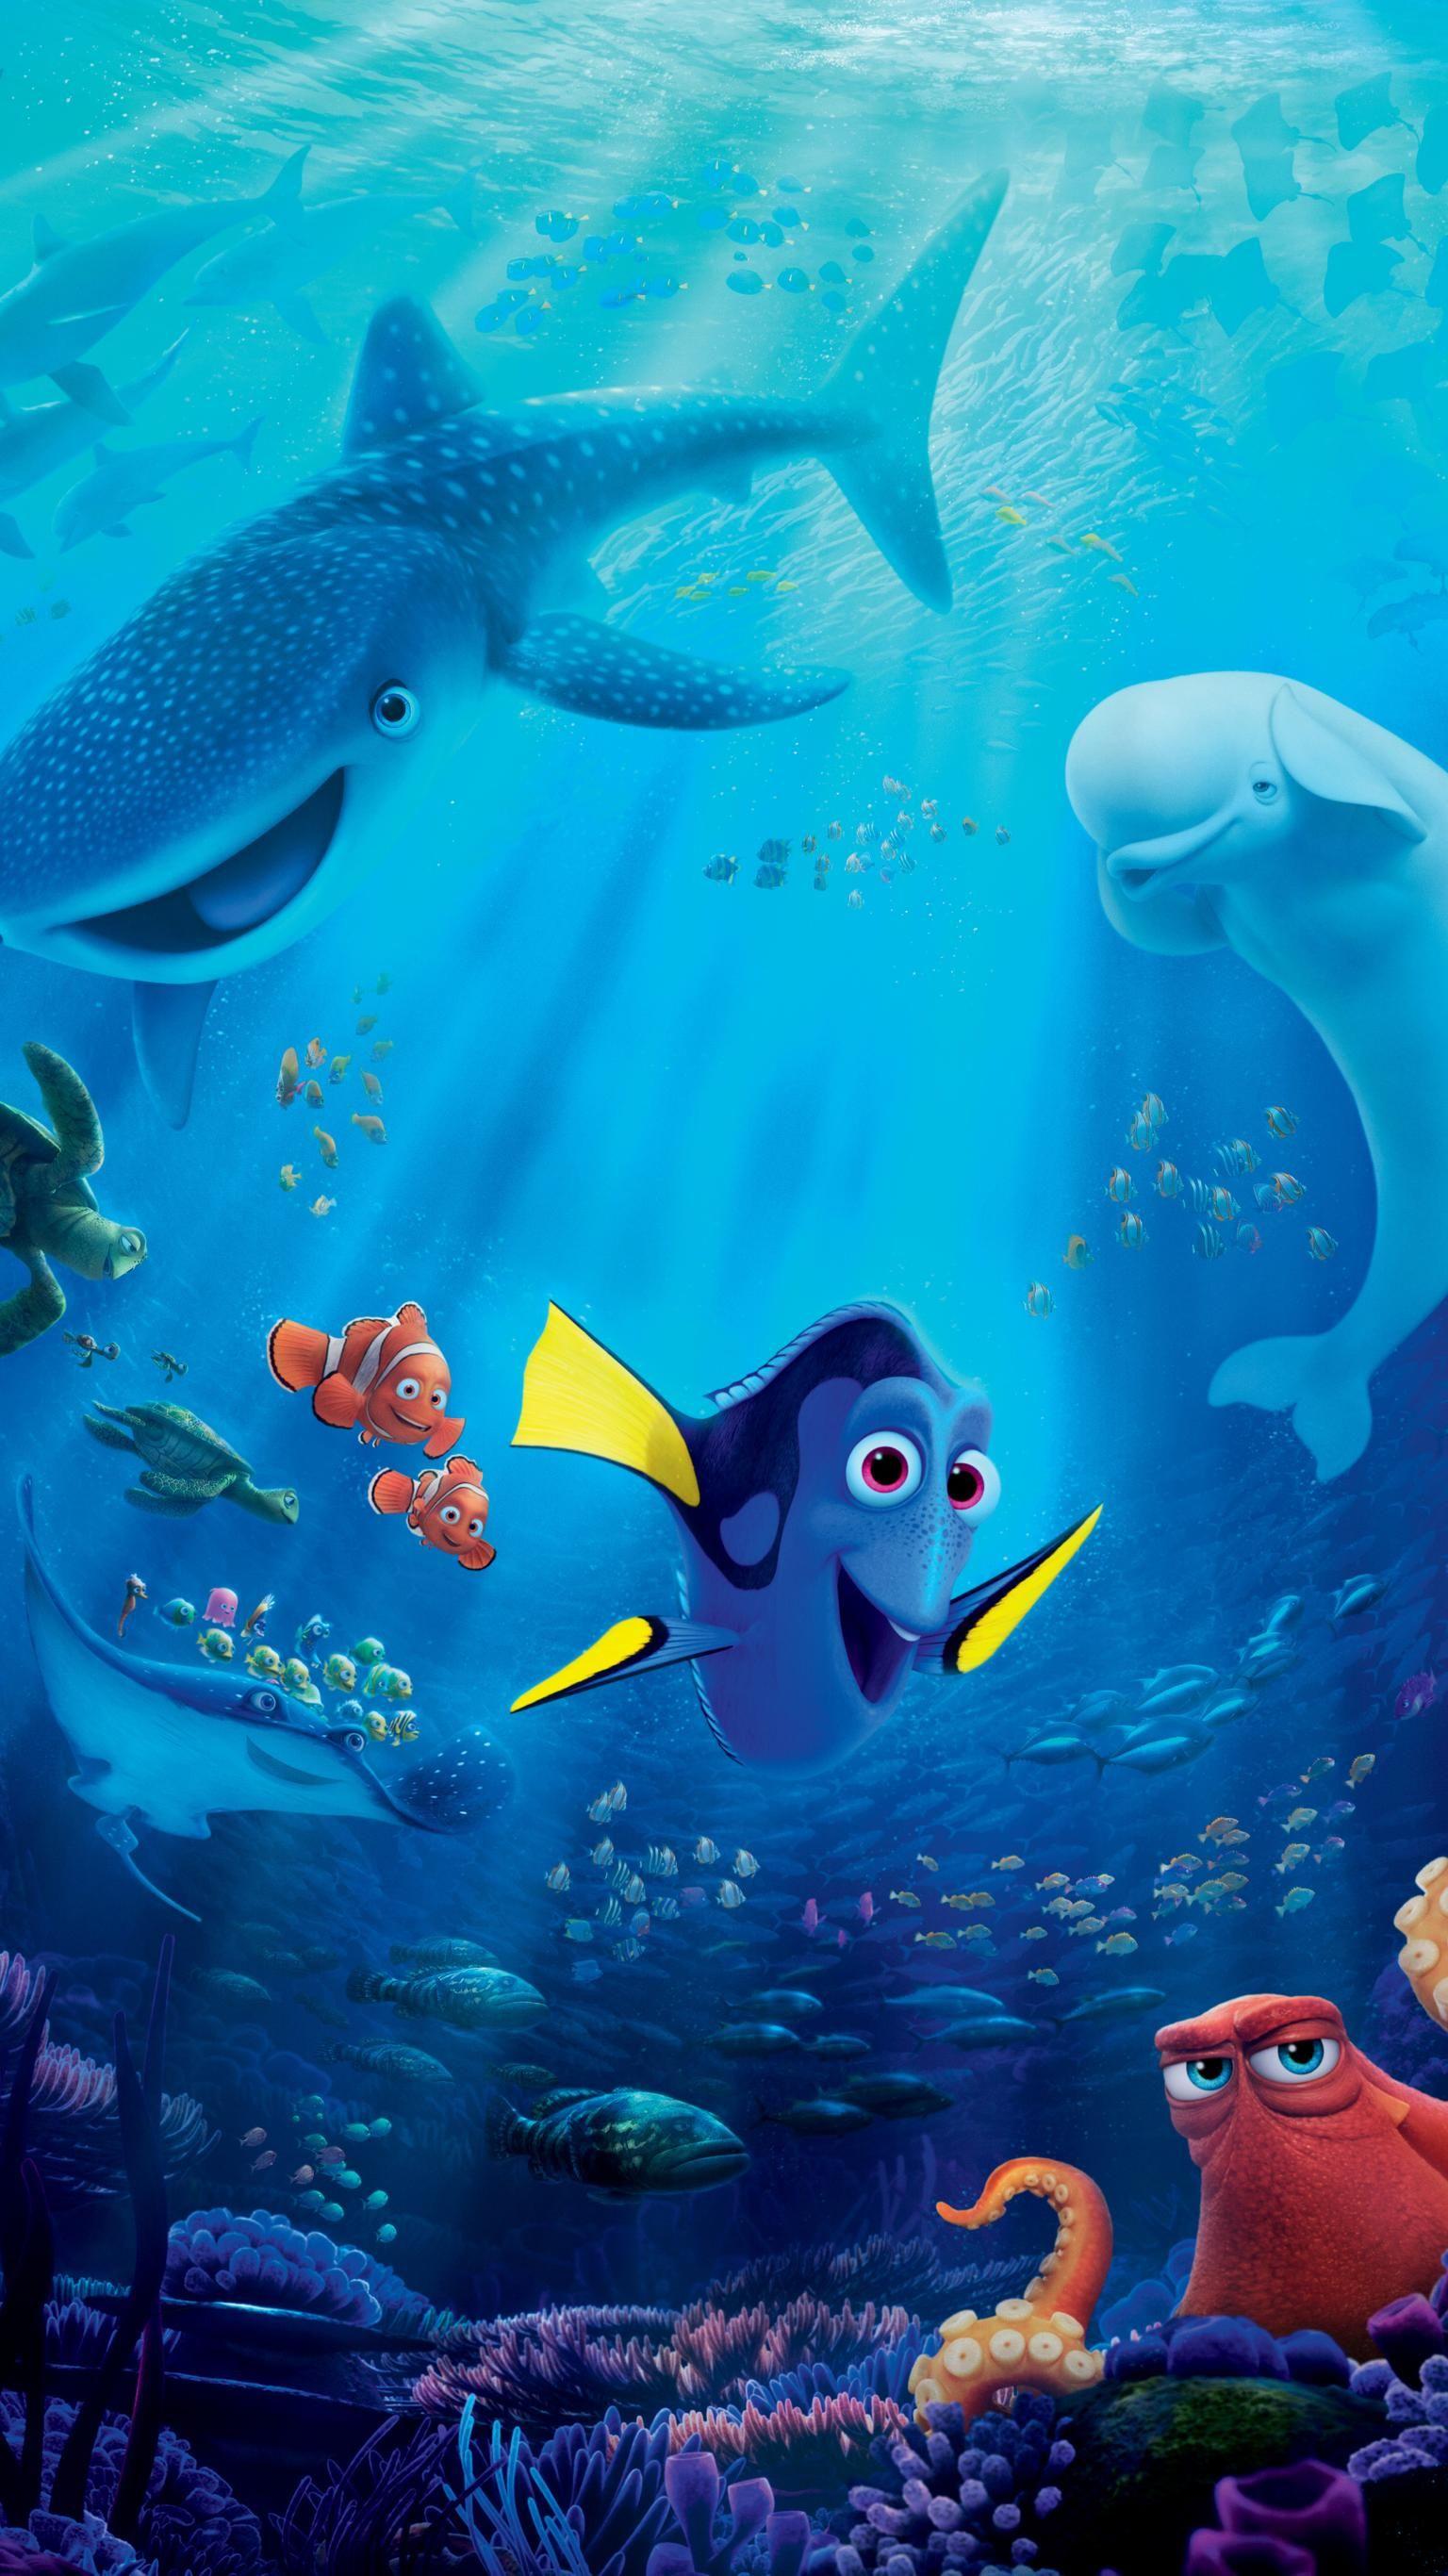 Finding Dory 2016 Phone Wallpaper Moviemania Finding Dory Movie Finding Dory Full Movie Finding Dory